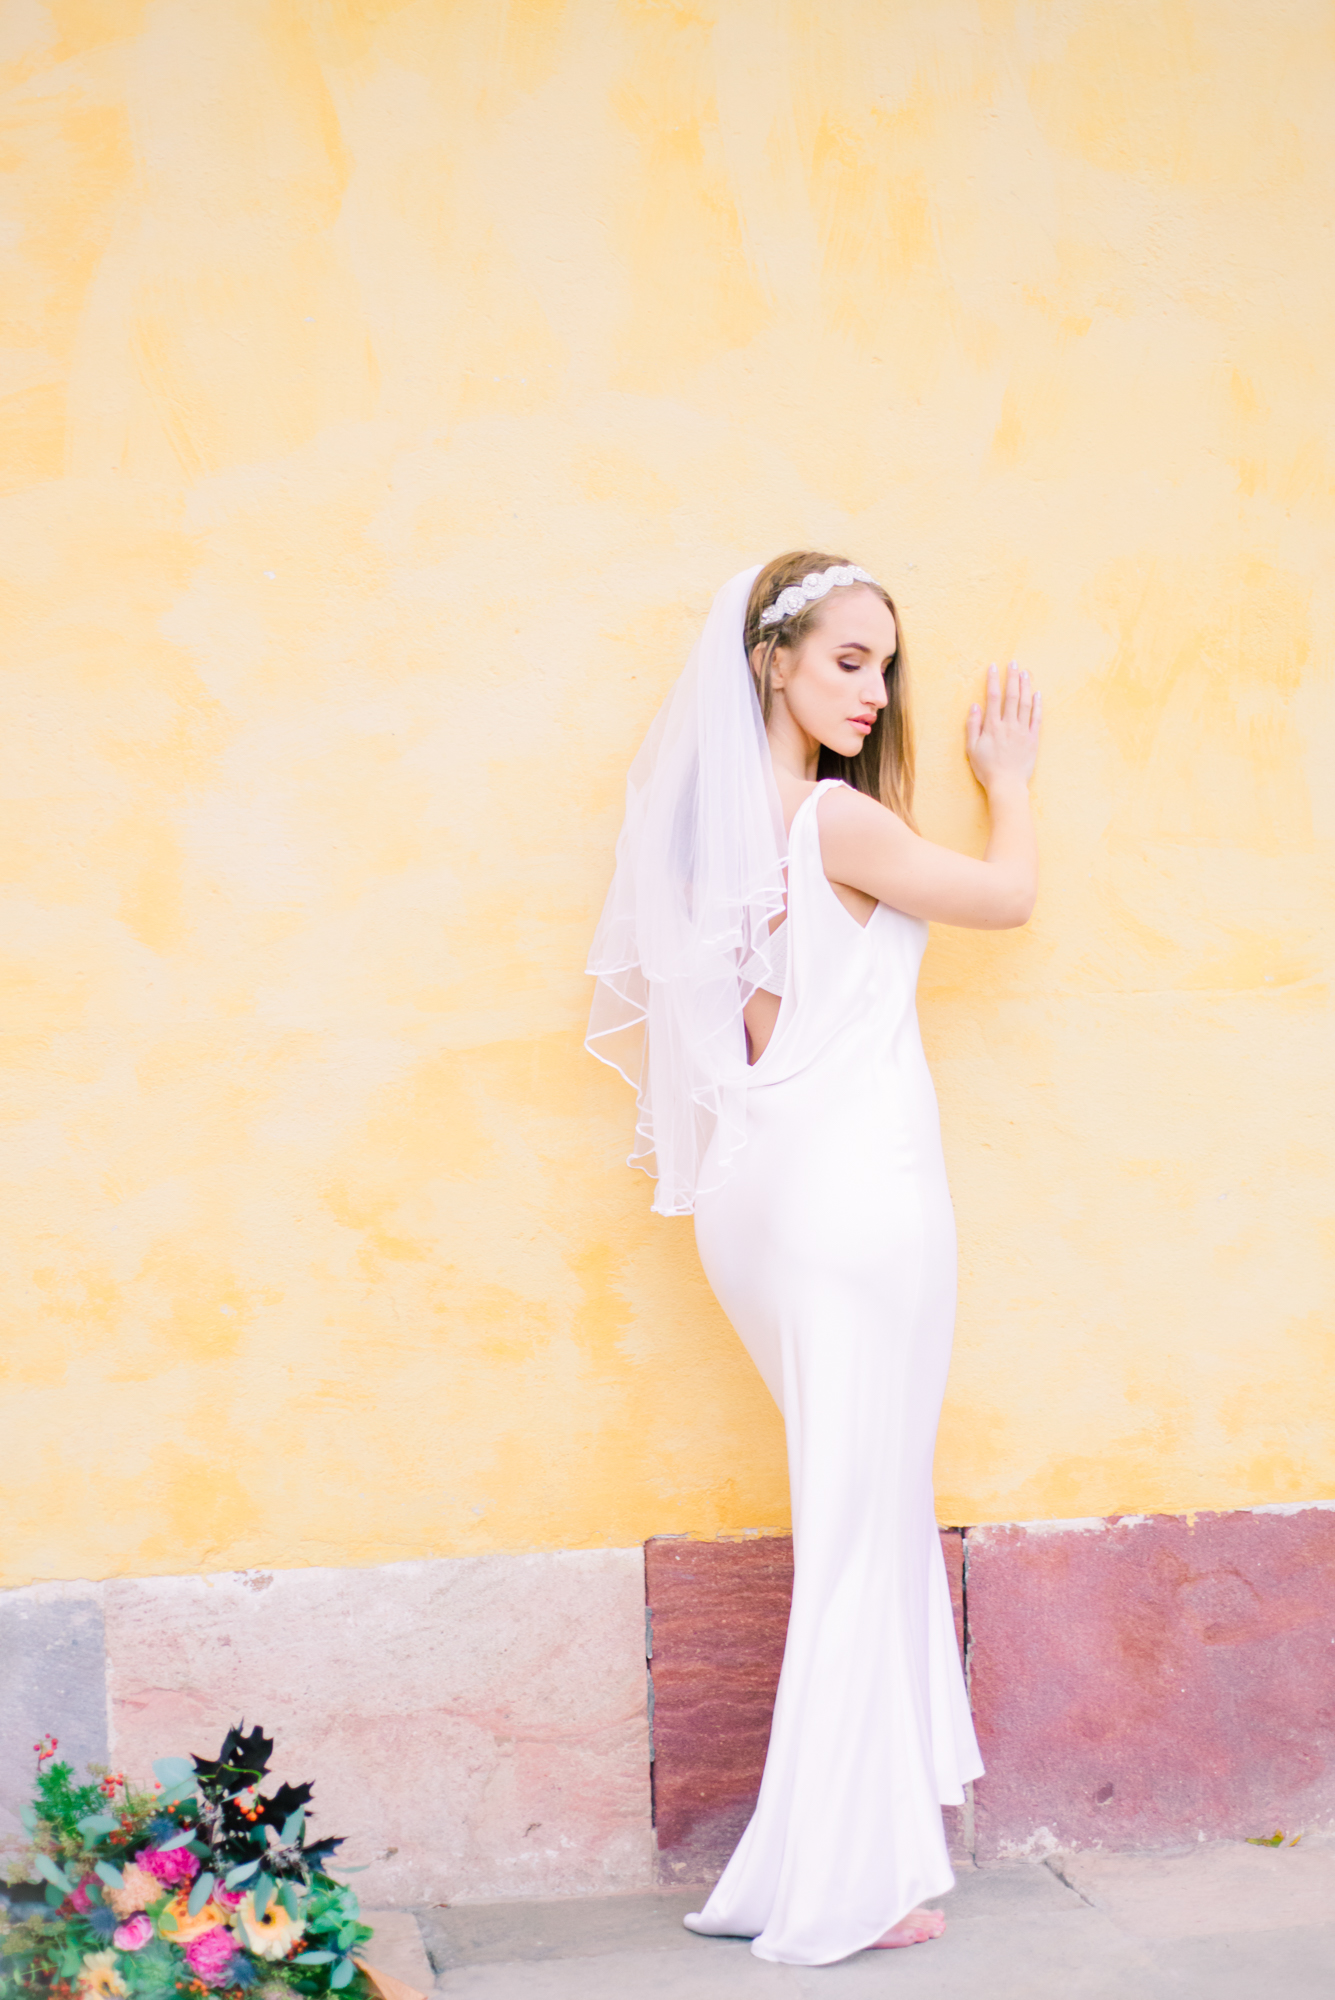 Elegant Organic Fall Swedish Bridal Wedding Styled Shoot - Erika Alvarenga Photography-132.jpg